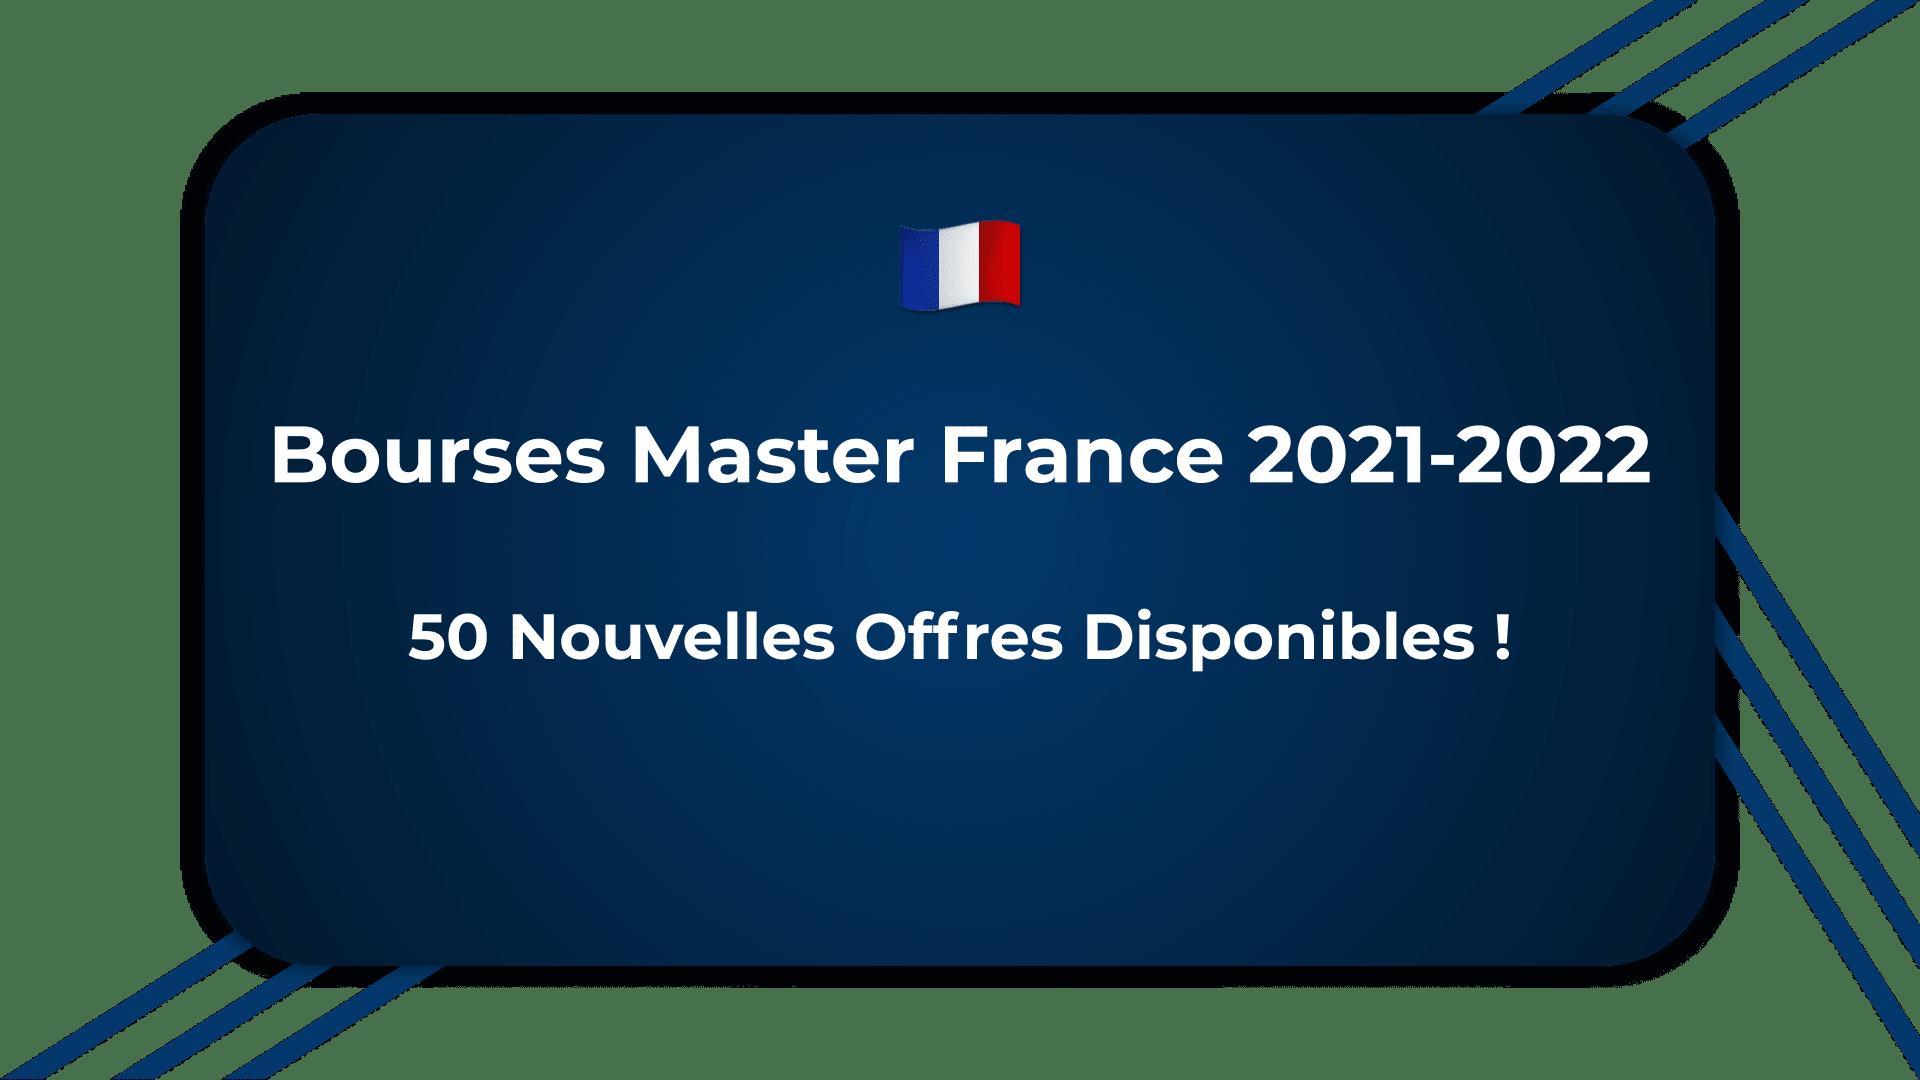 Bourses Master France